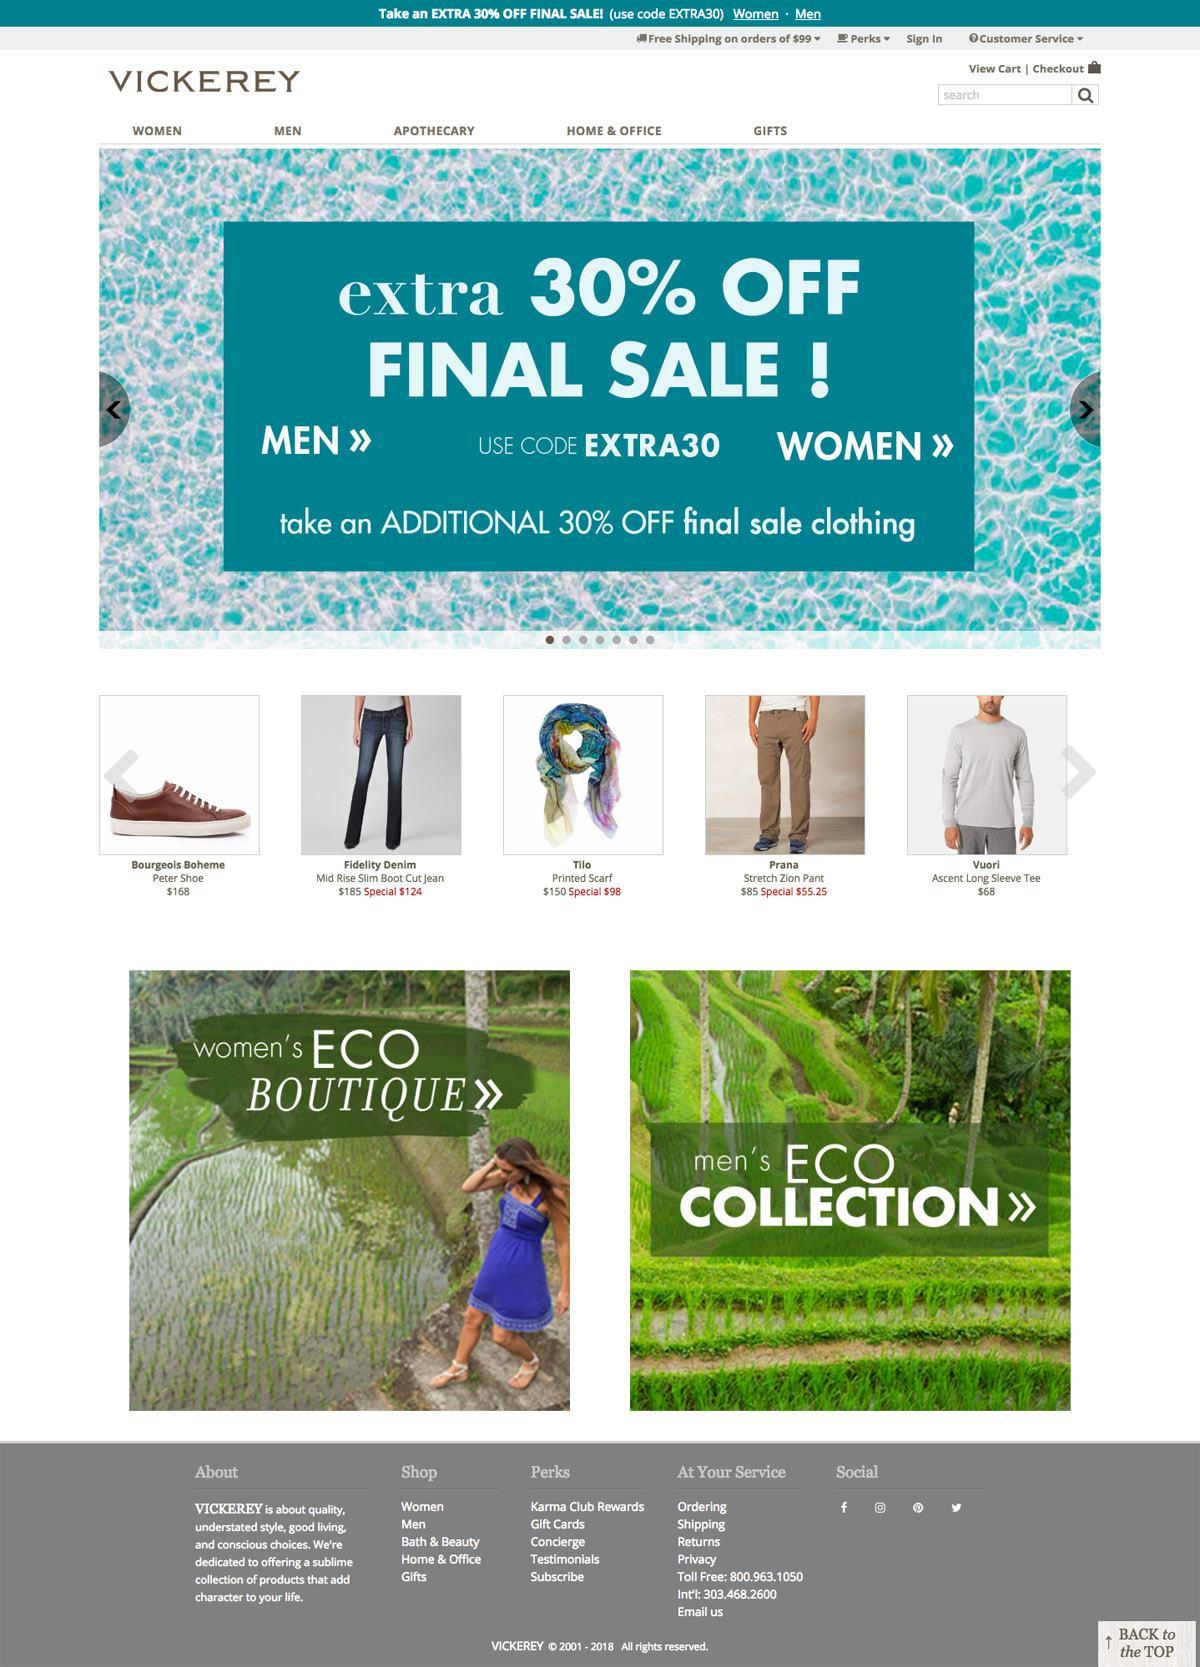 eCommerce website: Vickerey